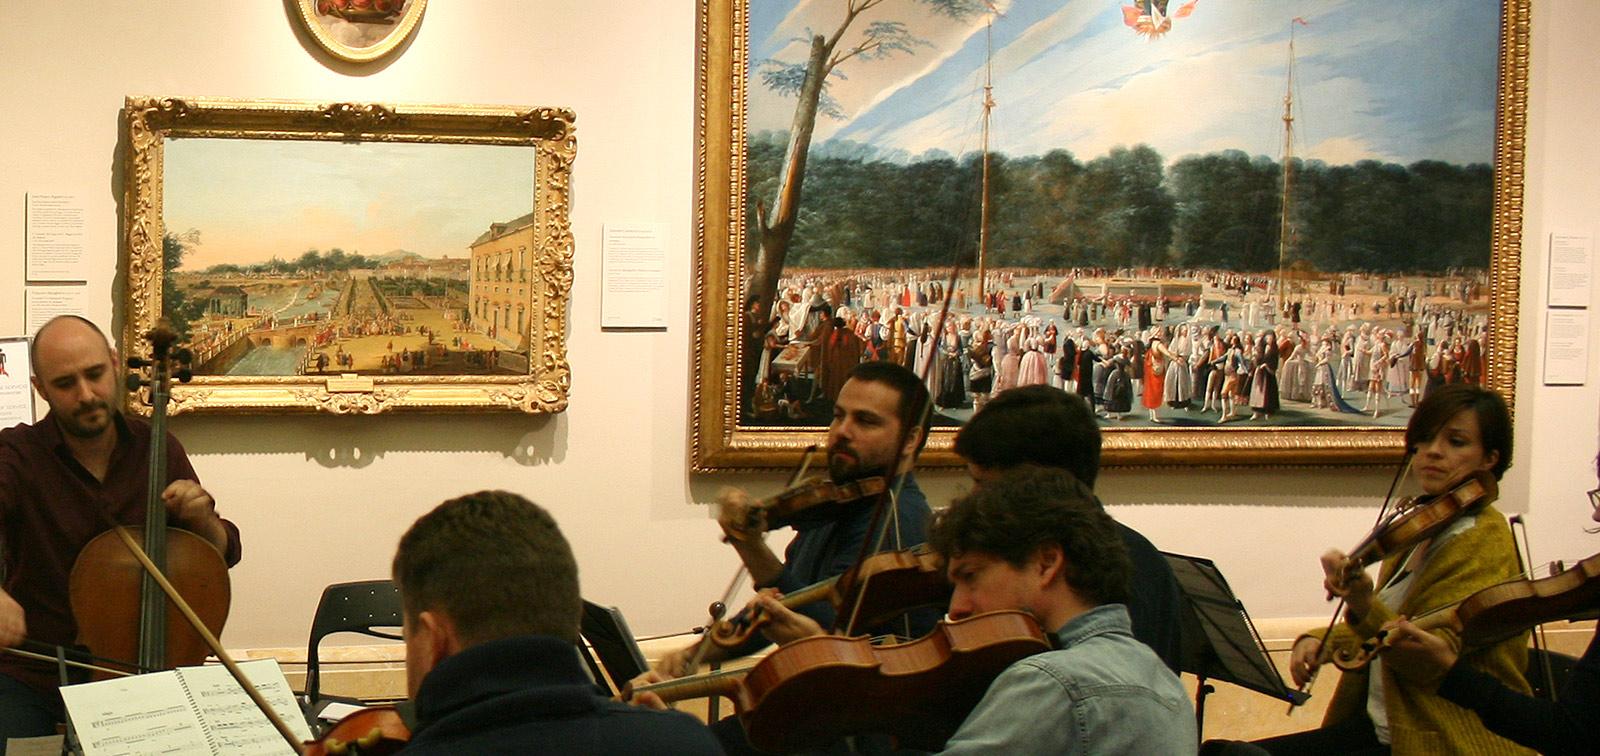 XXIX Festival Internacional de Arte Sacro de la Comunidad de Madrid